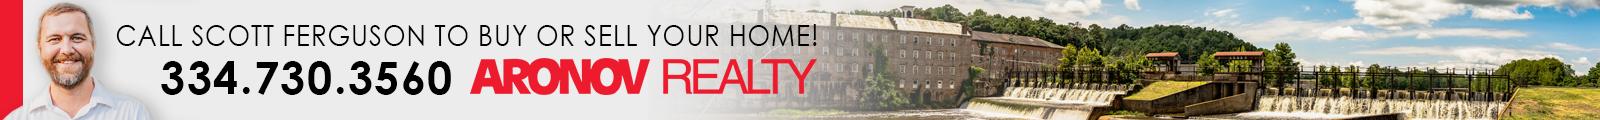 Scott Ferguson Real Estate Professional